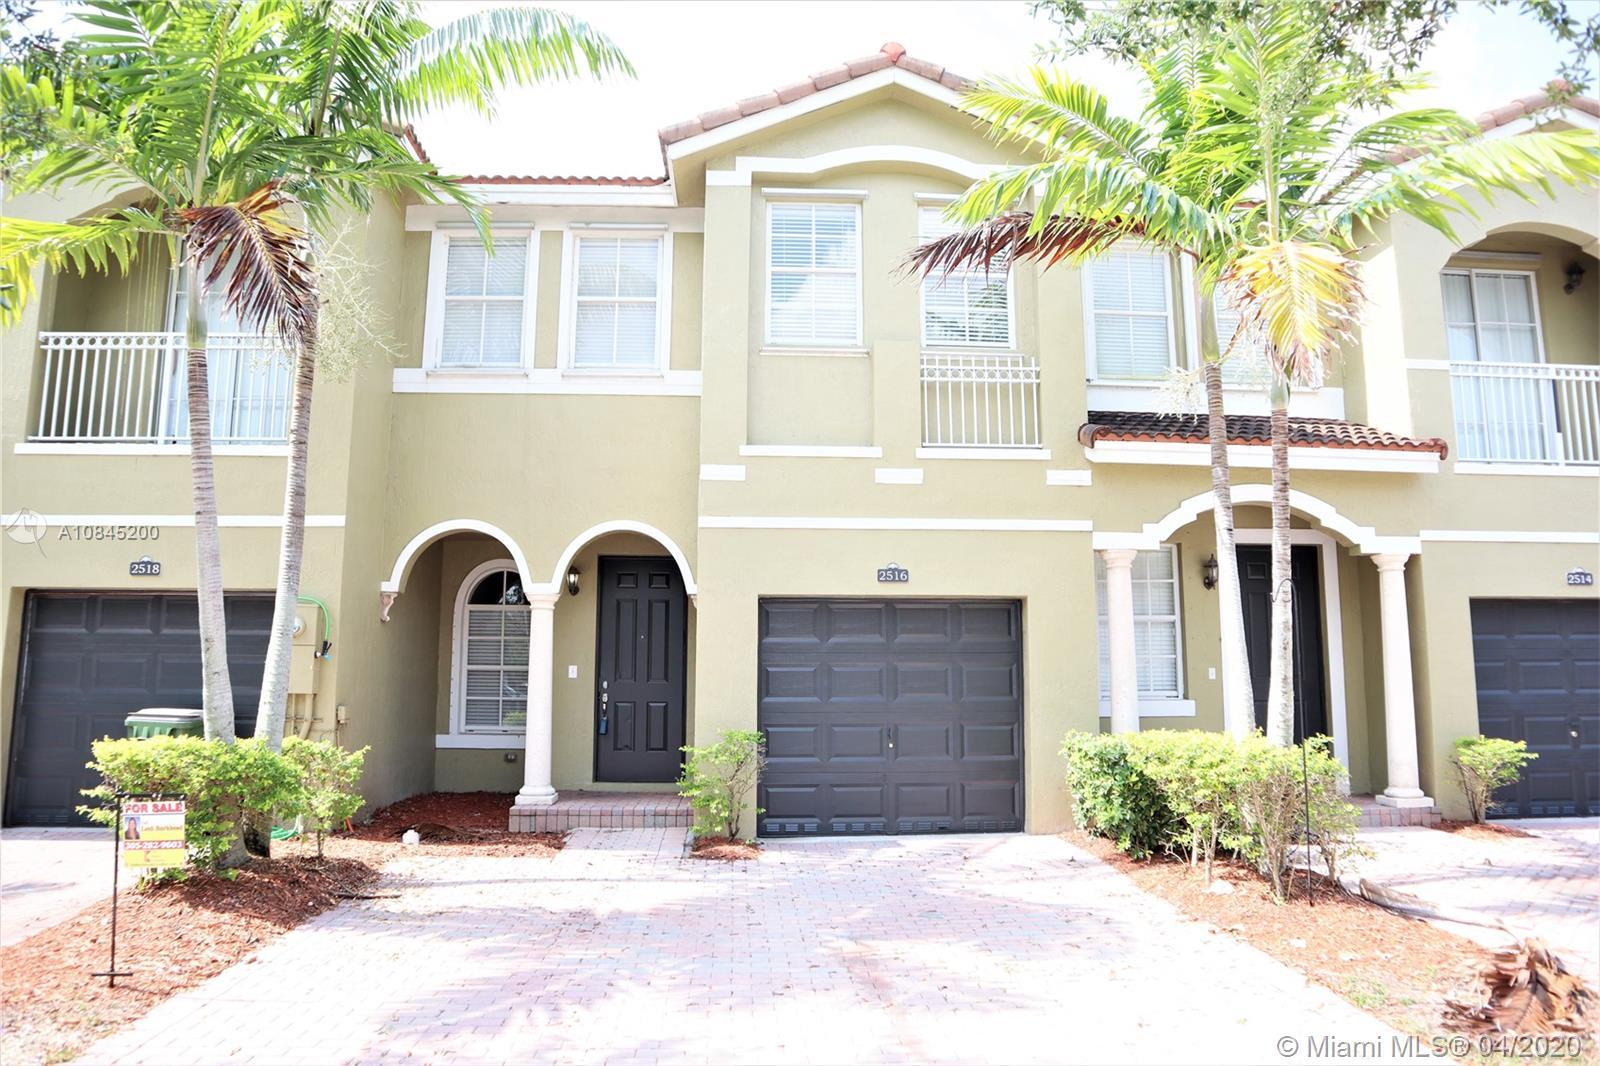 2516 SE 14 Ct, Homestead, FL 33035 - Homestead, FL real estate listing